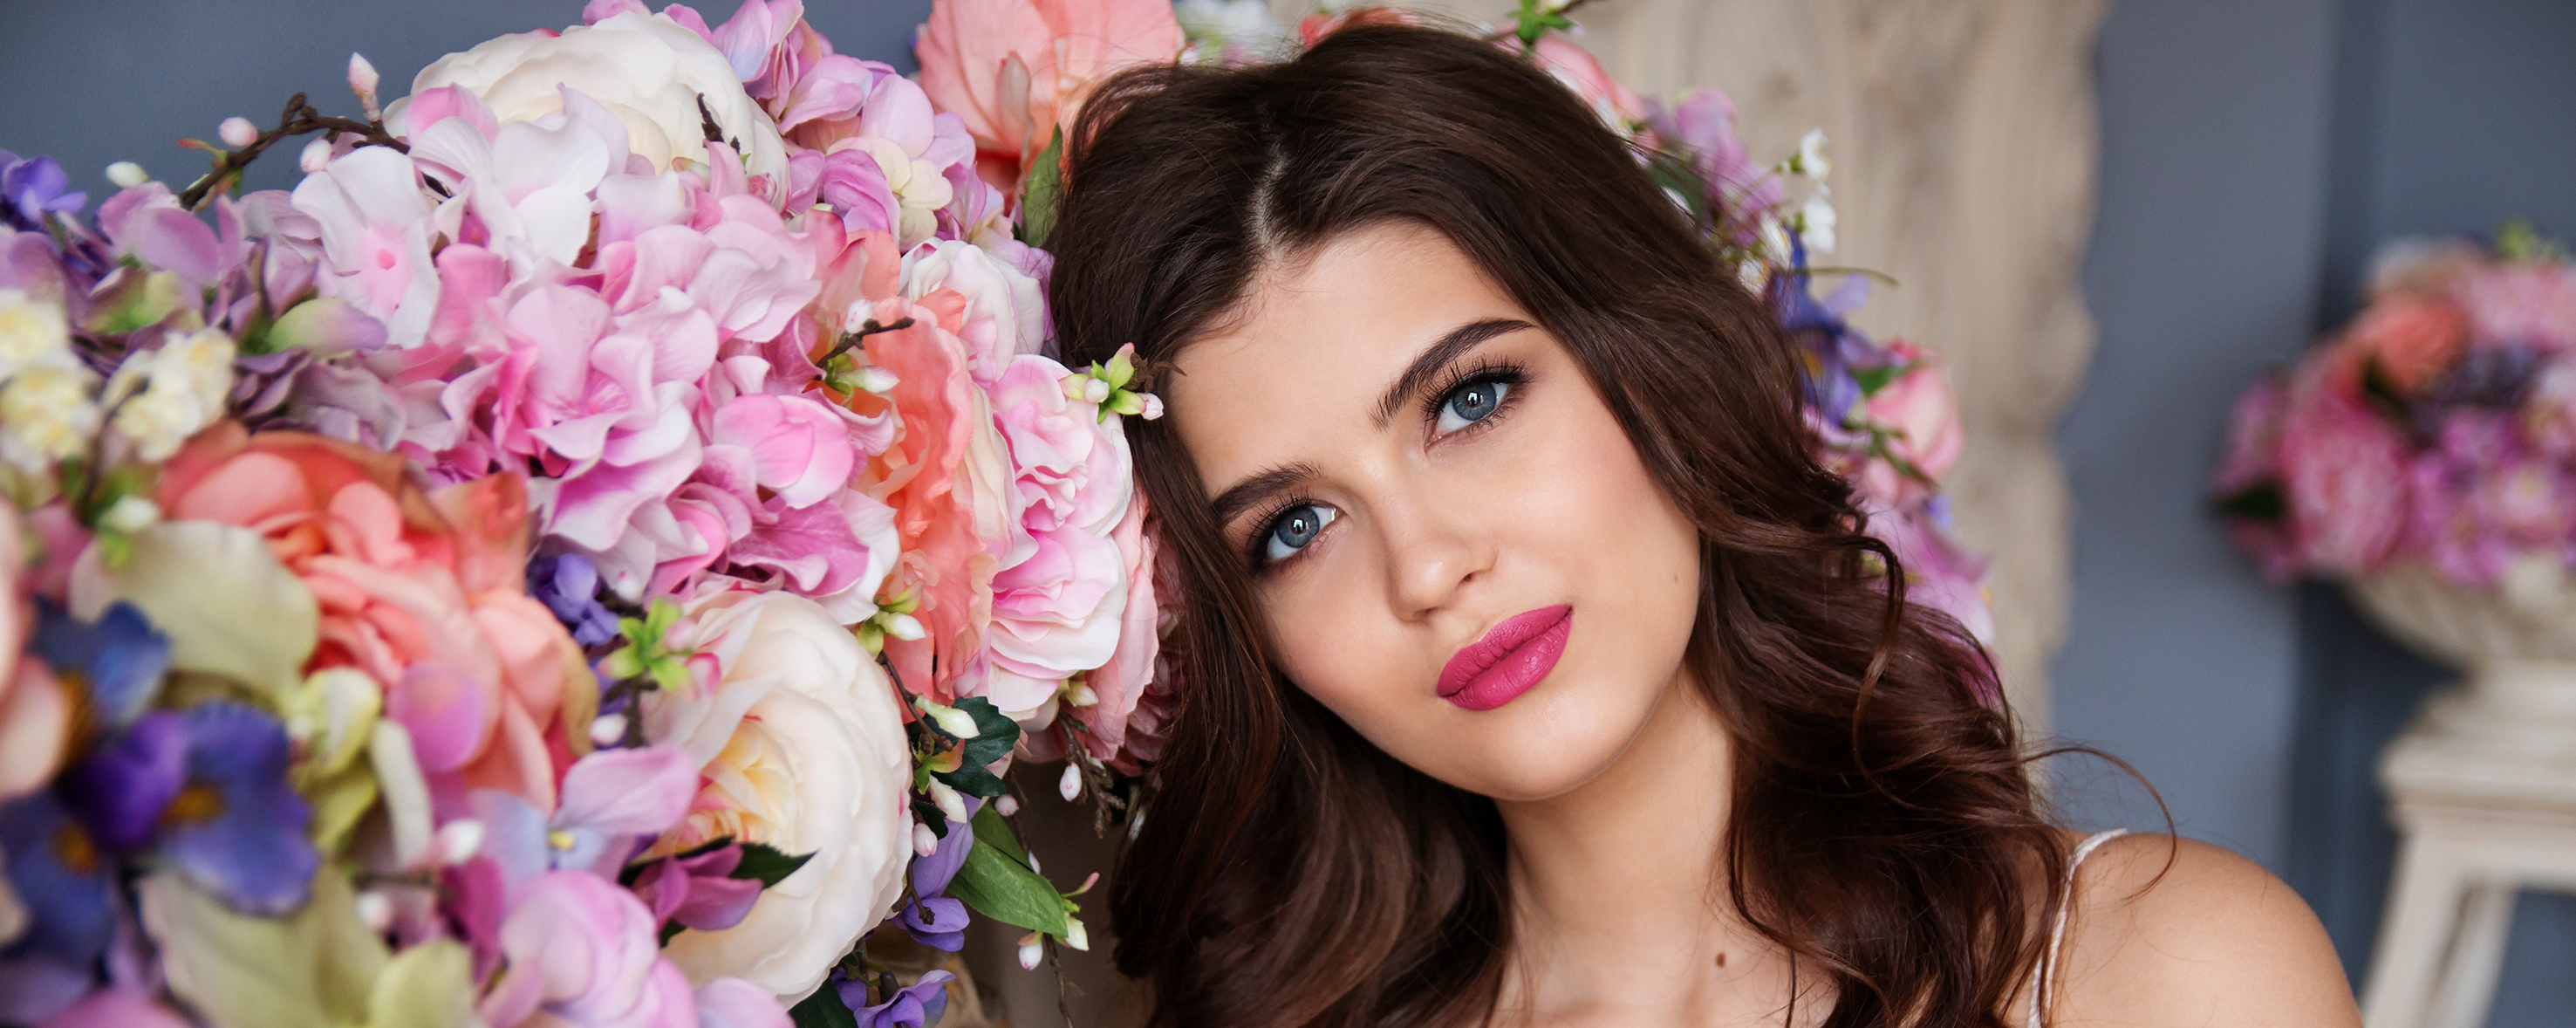 The pink blush- Makeup Artist / Stylist